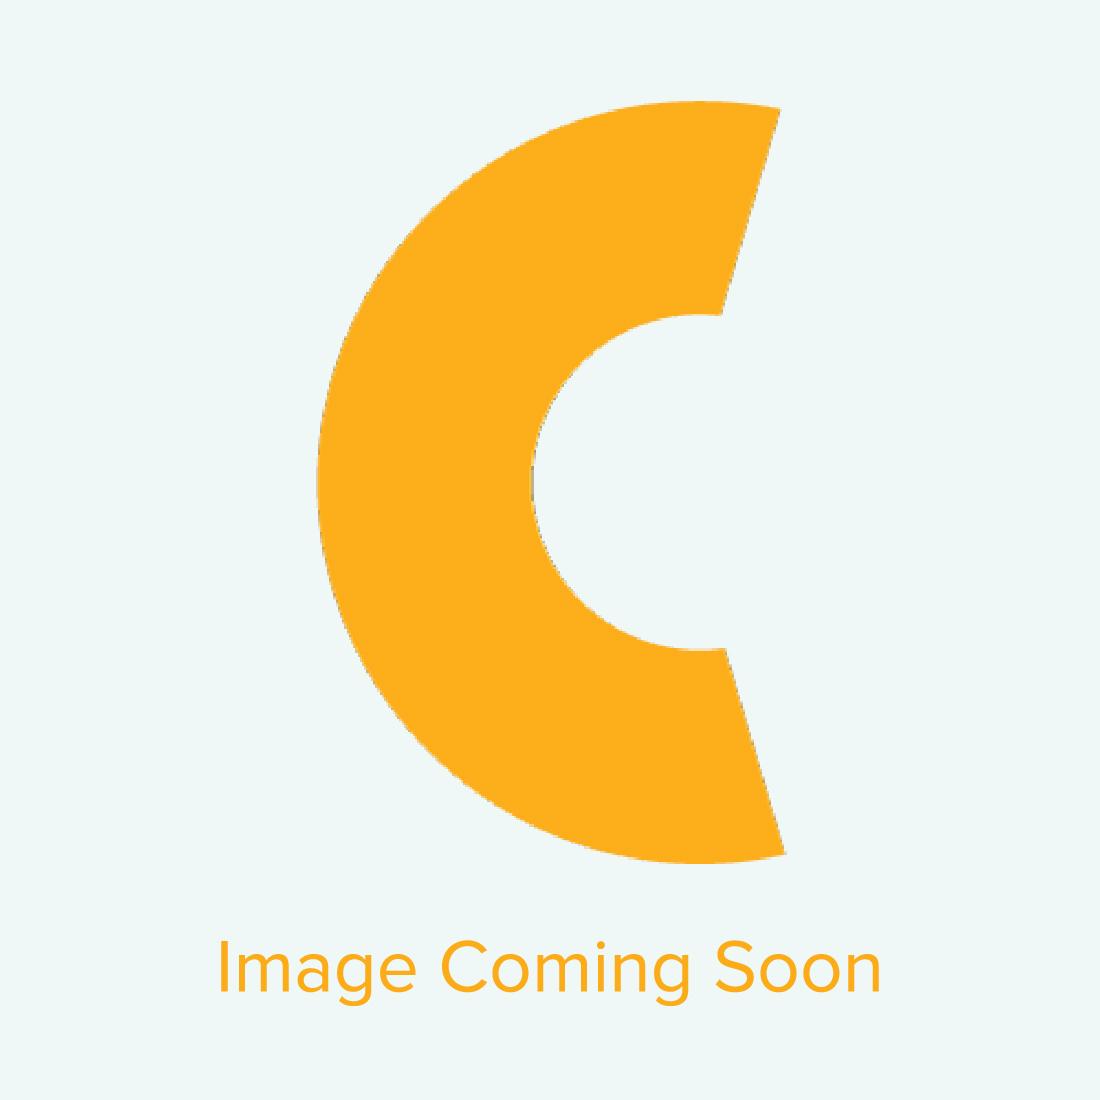 OKI Data pro920WT/910 Replacement Toner Cartridges